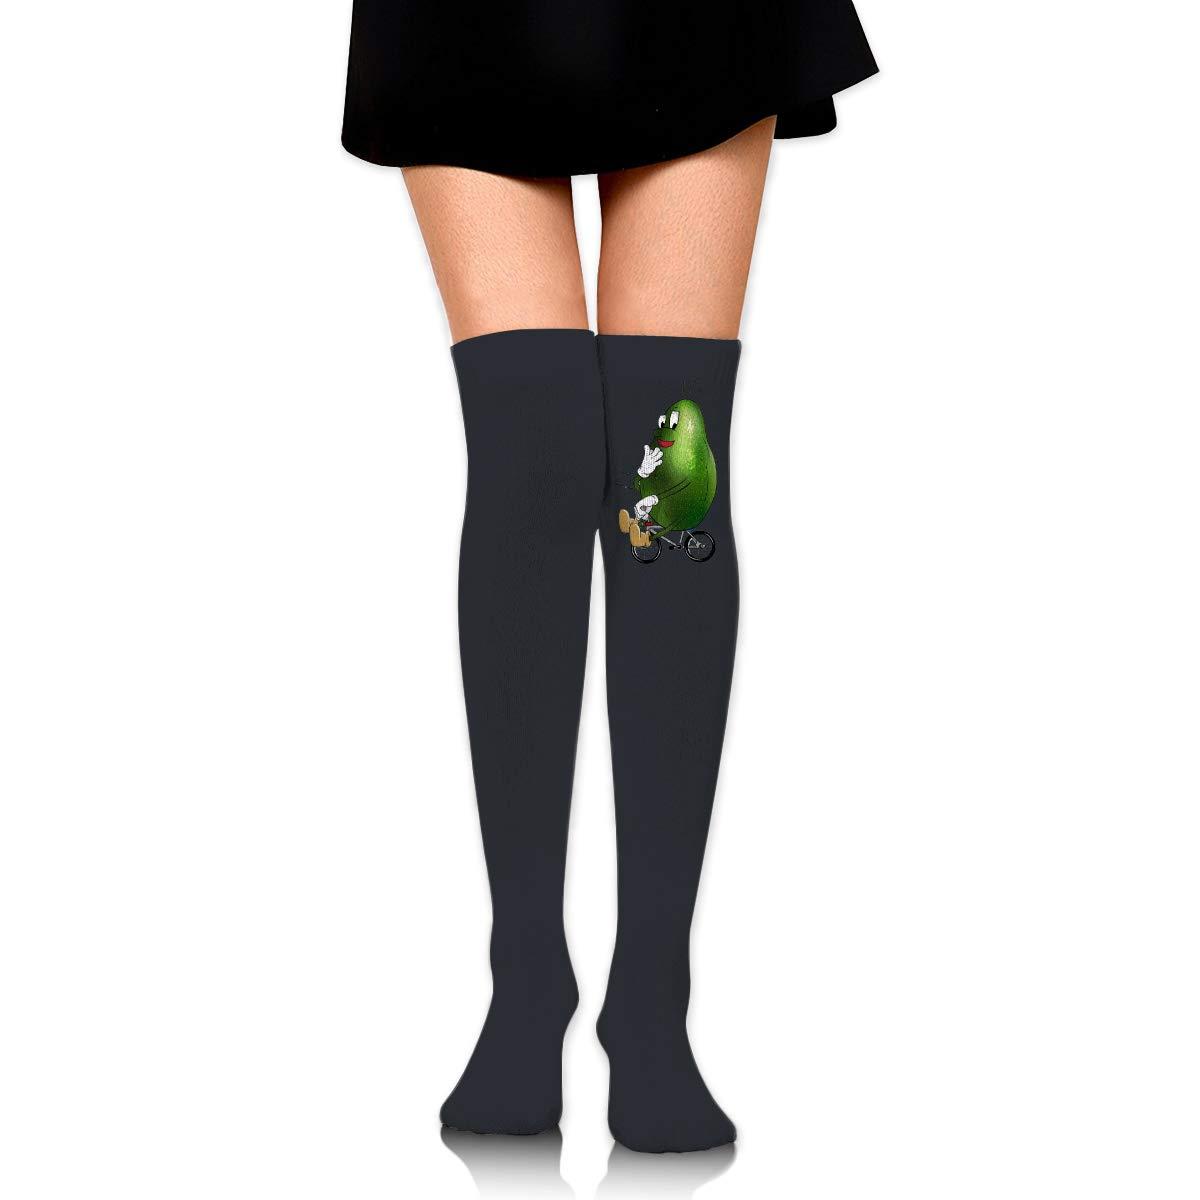 Avocado Riding Bike Logo Long Tight Thigh High Socks Over The Knee High Boot Stockings Leg Warmers